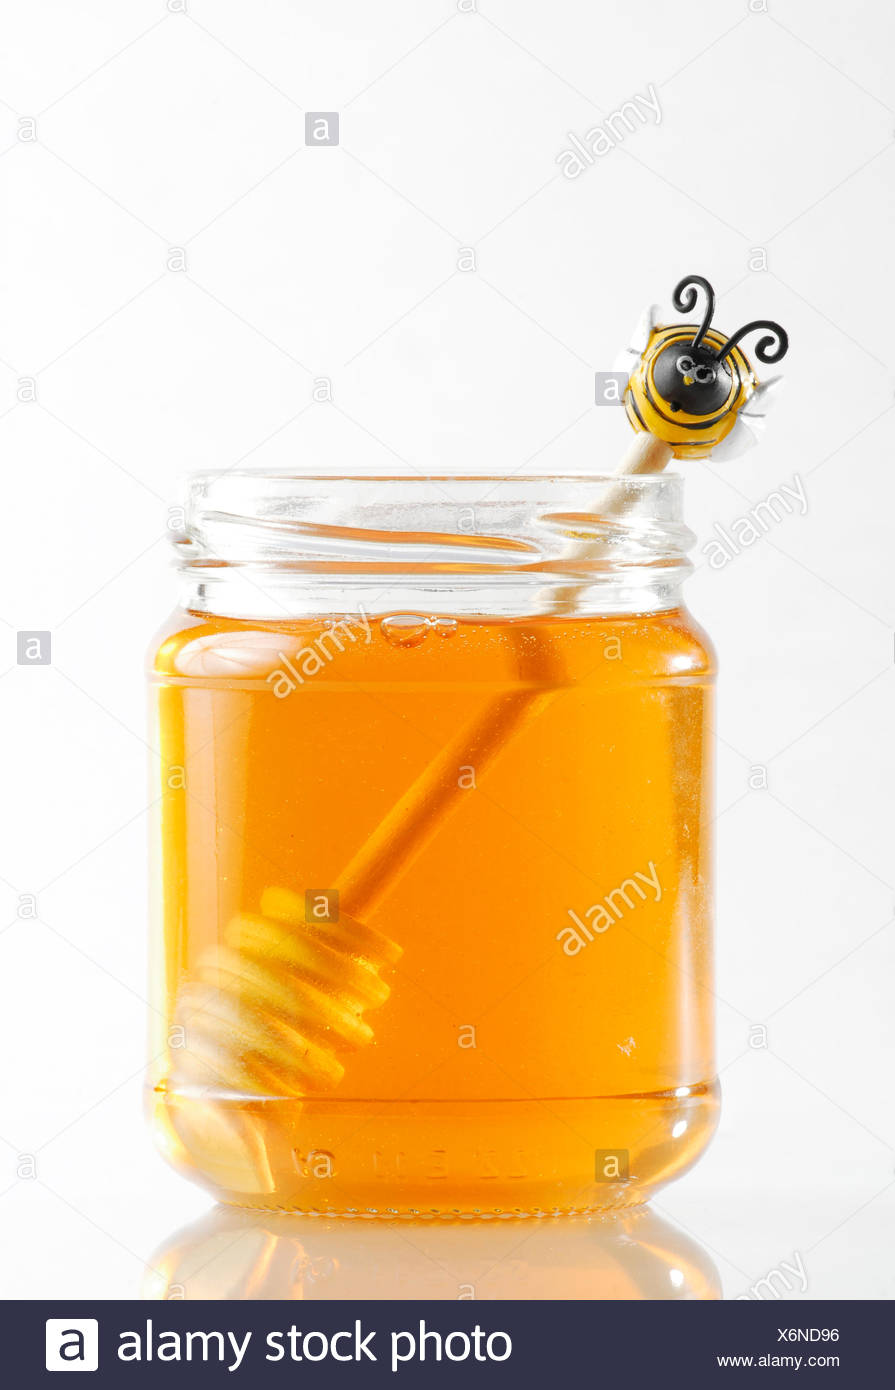 Honey jar with honey spoon - Stock Image